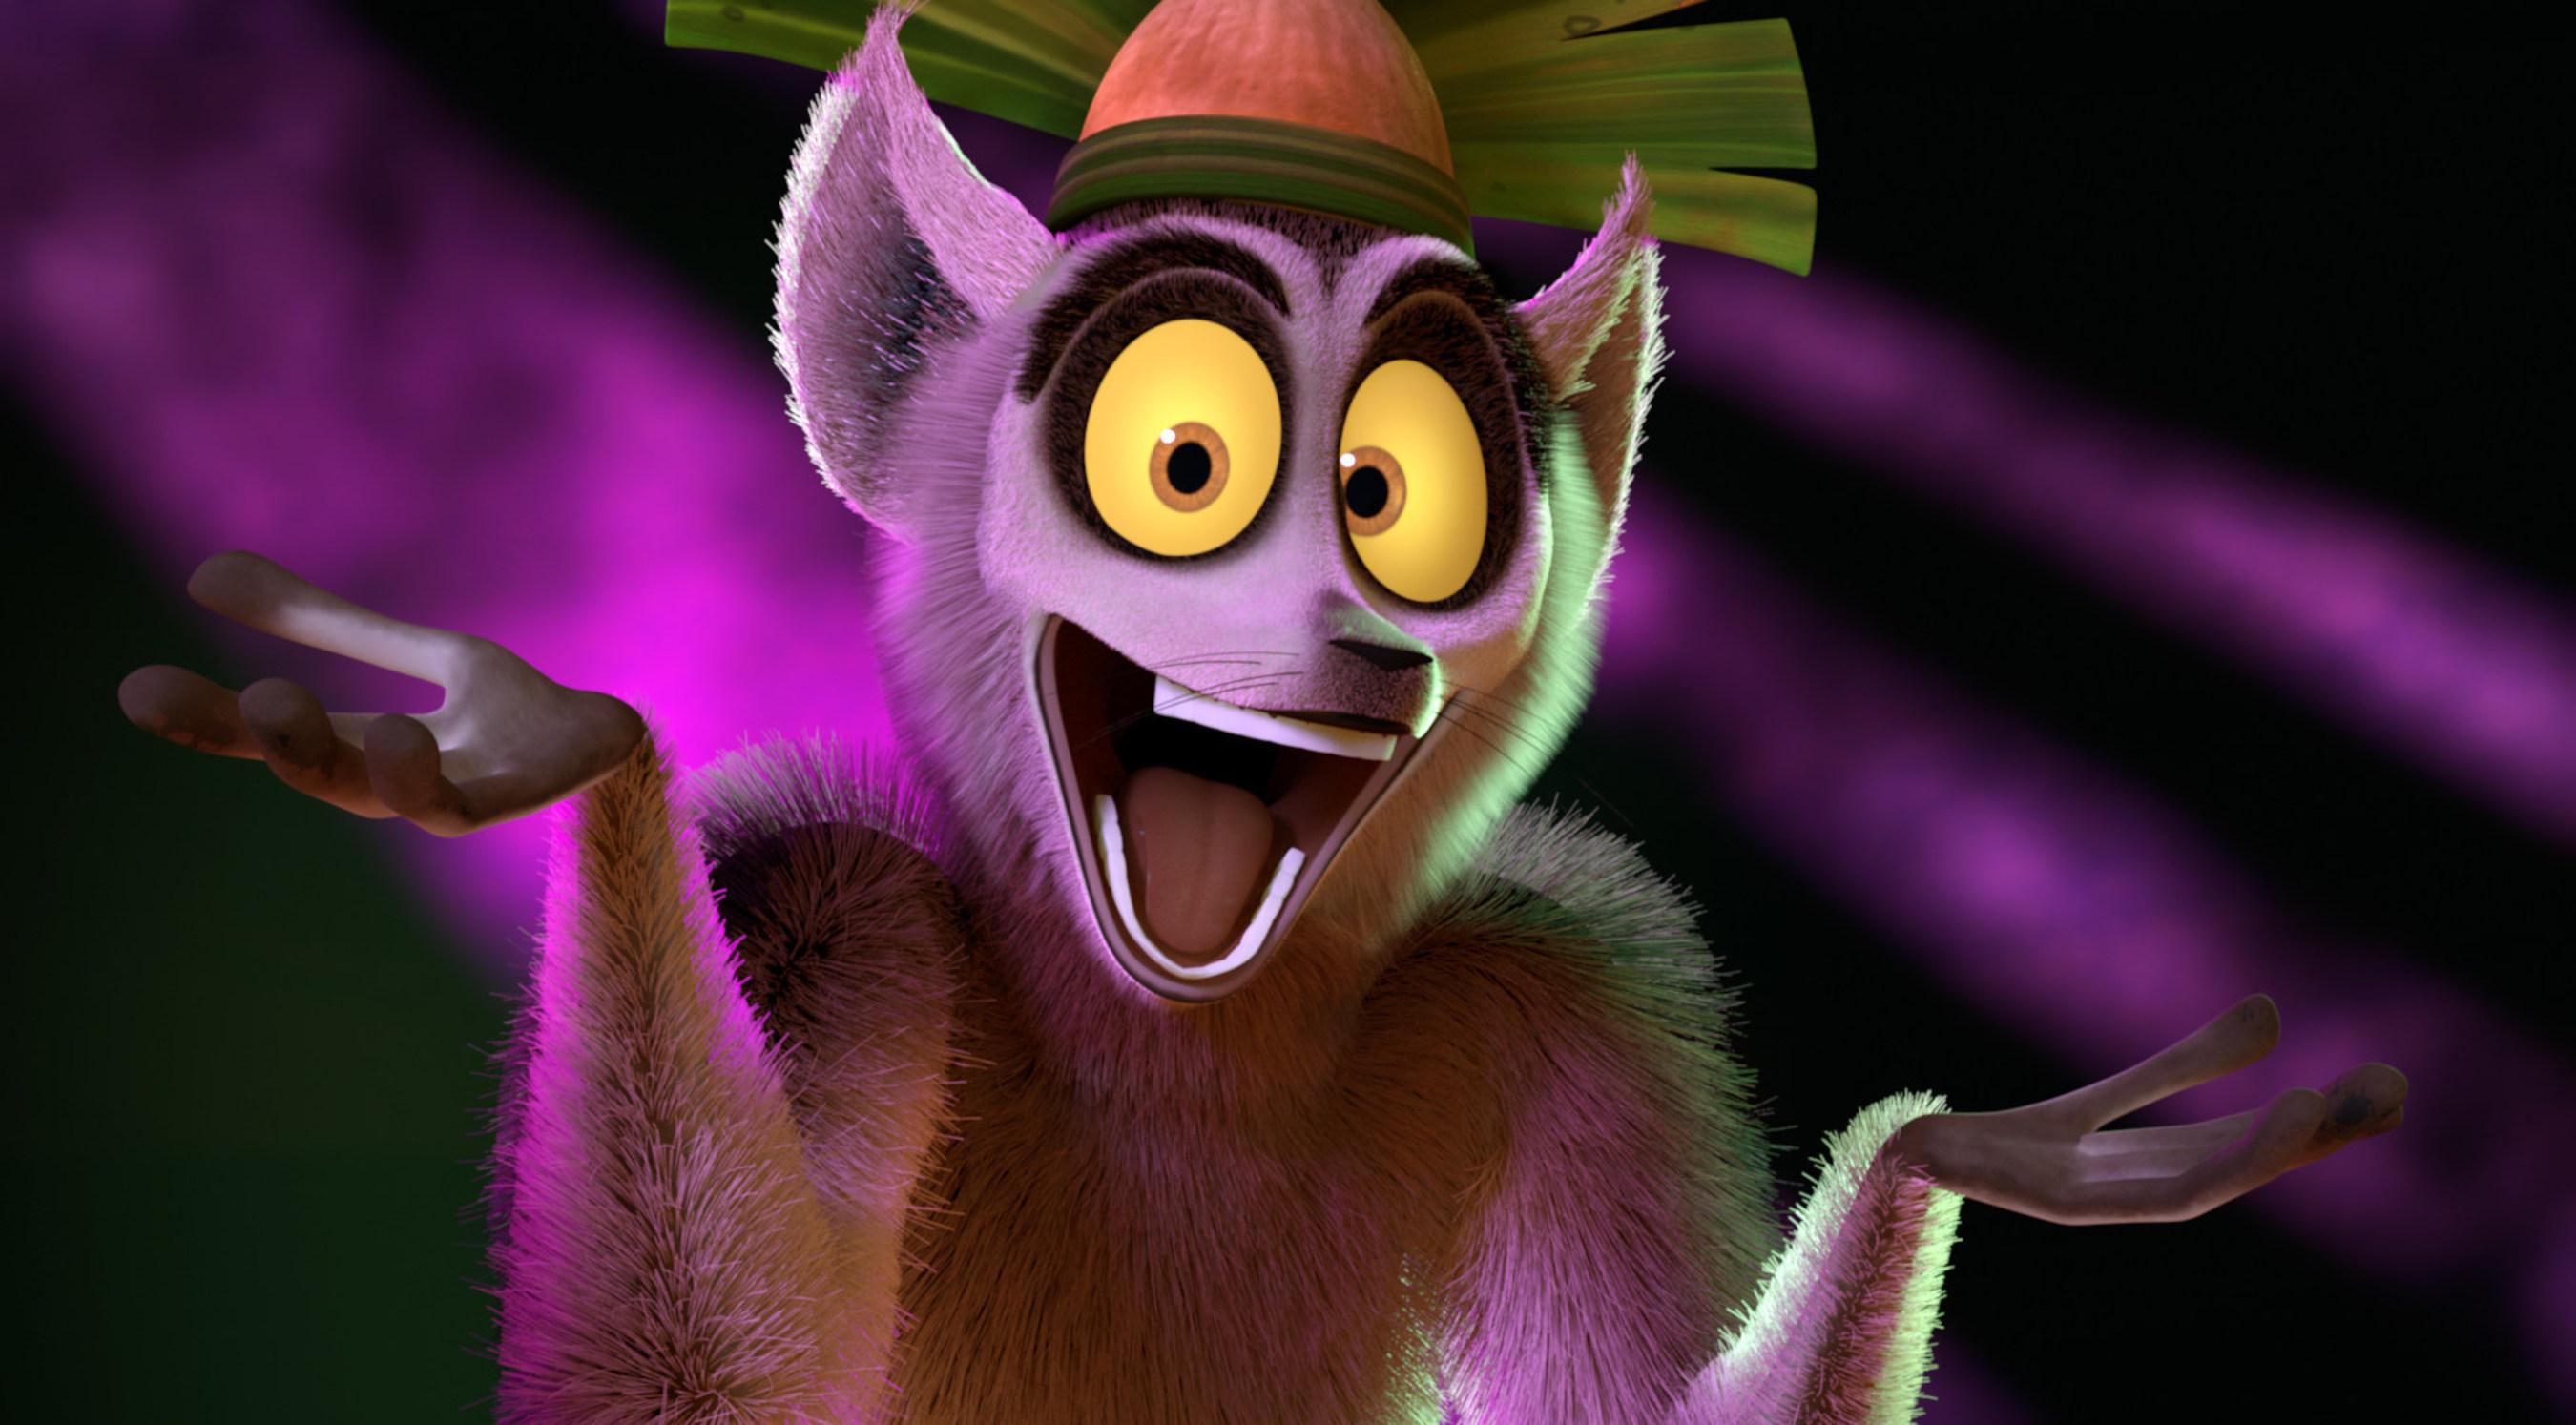 DreamWorks Animation's All Hail King Julien series will premiere on Netflix December 19